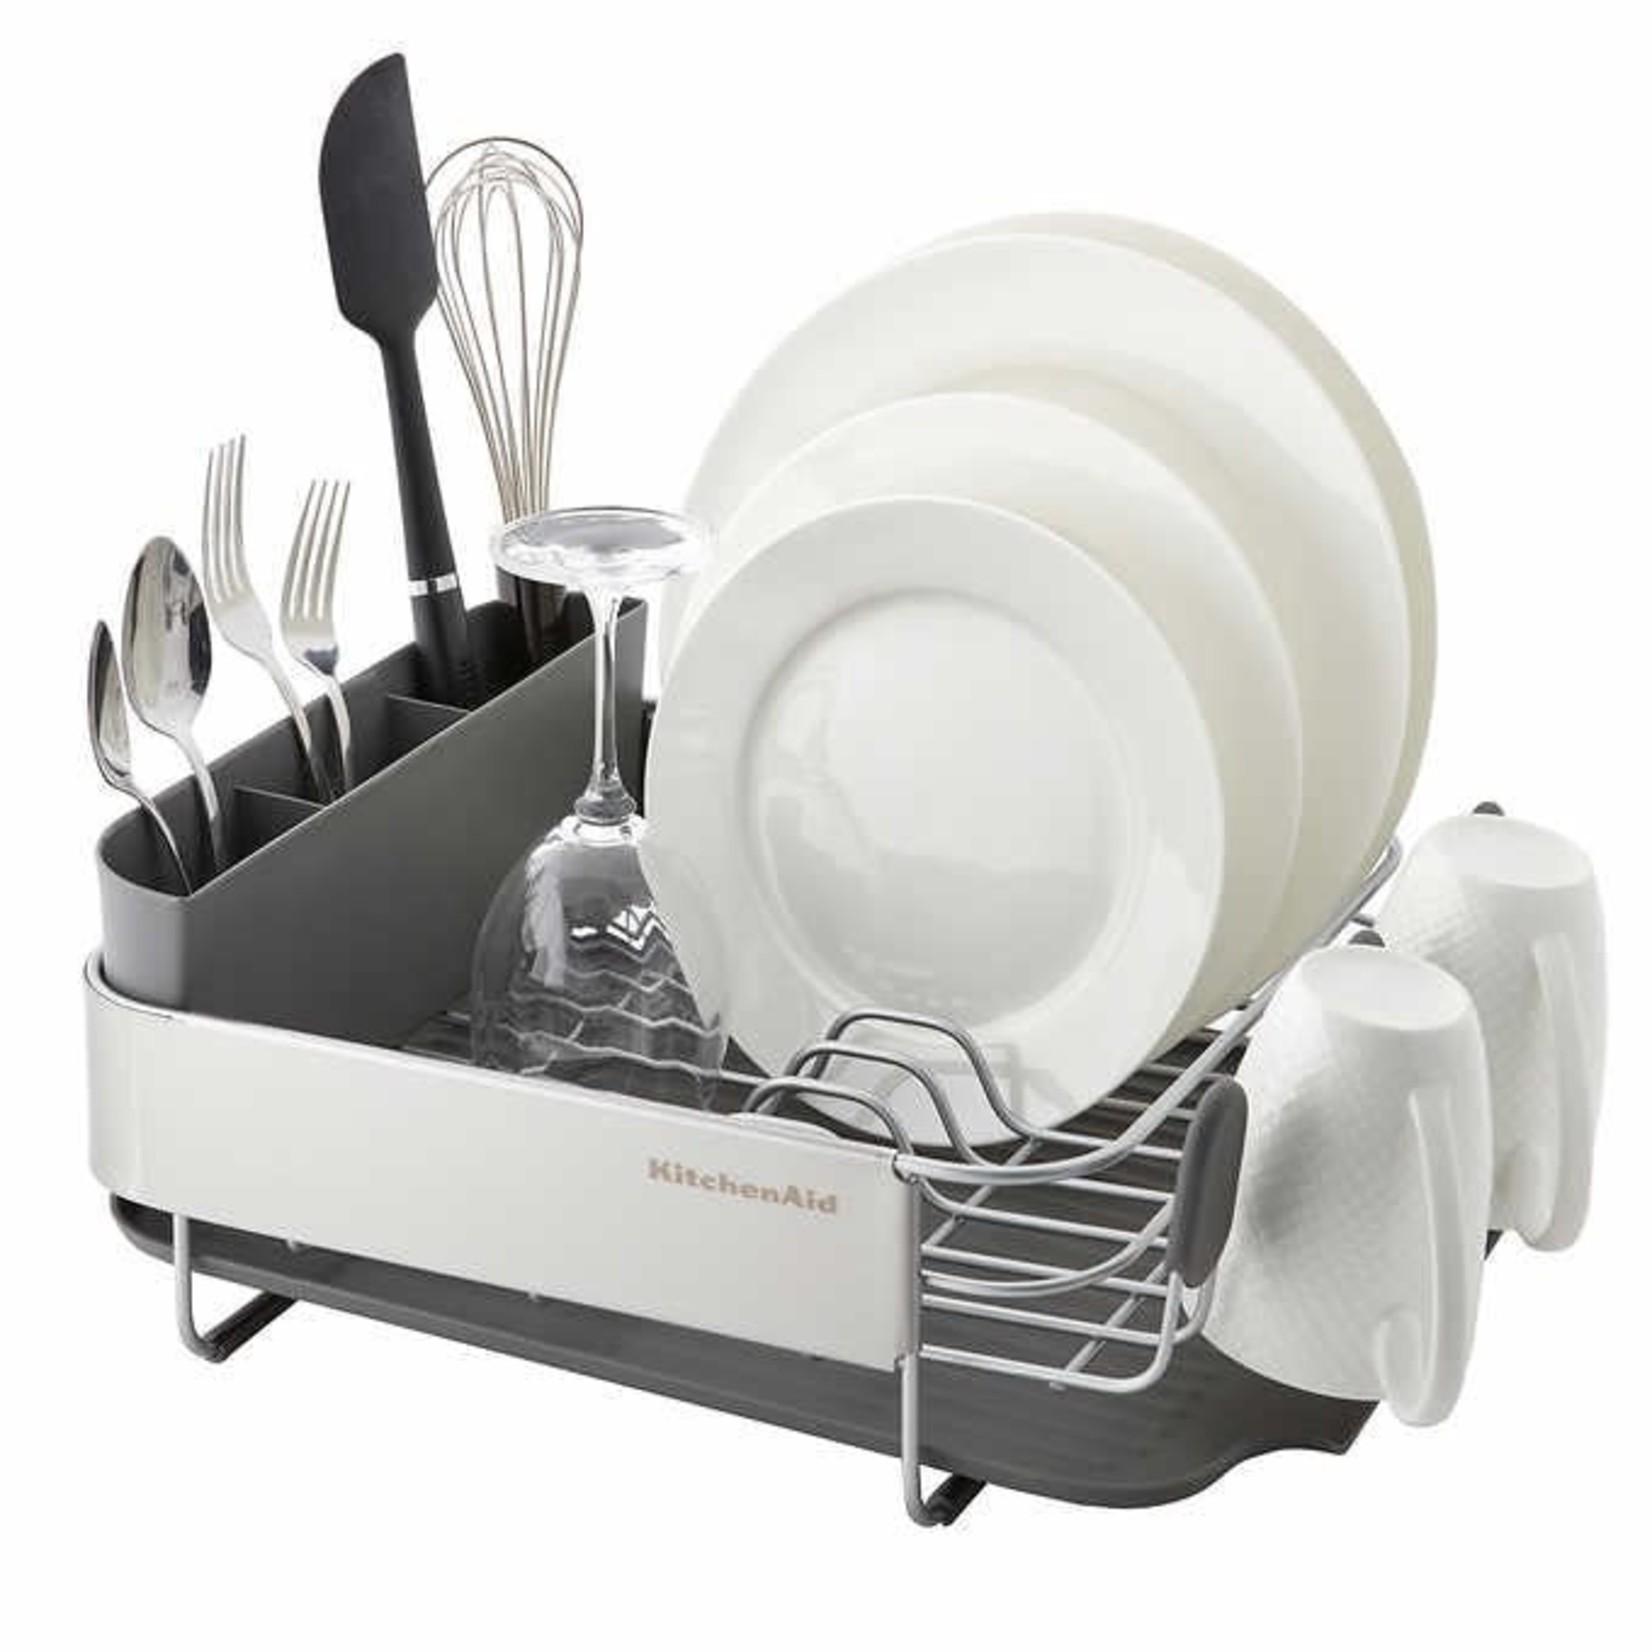 Kitchenaid Compact Dish-Drying Rack